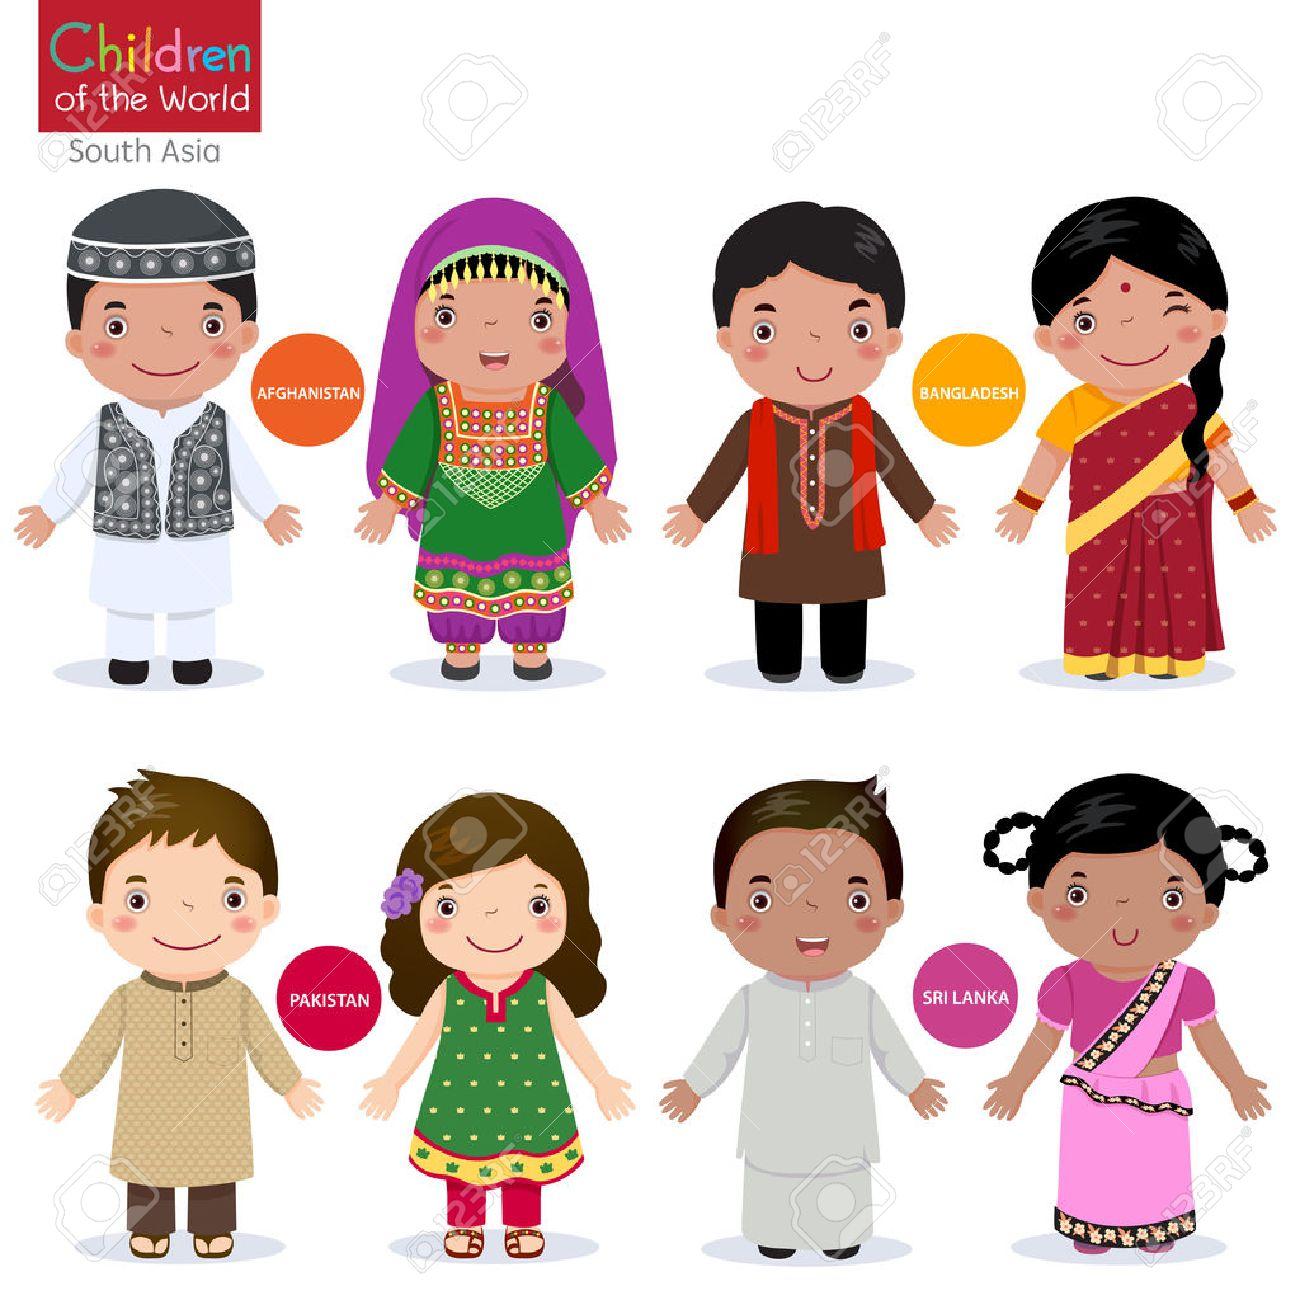 Kids in traditional costume Afghanistan, Bangladesh, Pakistan and Srilanka - 51222623